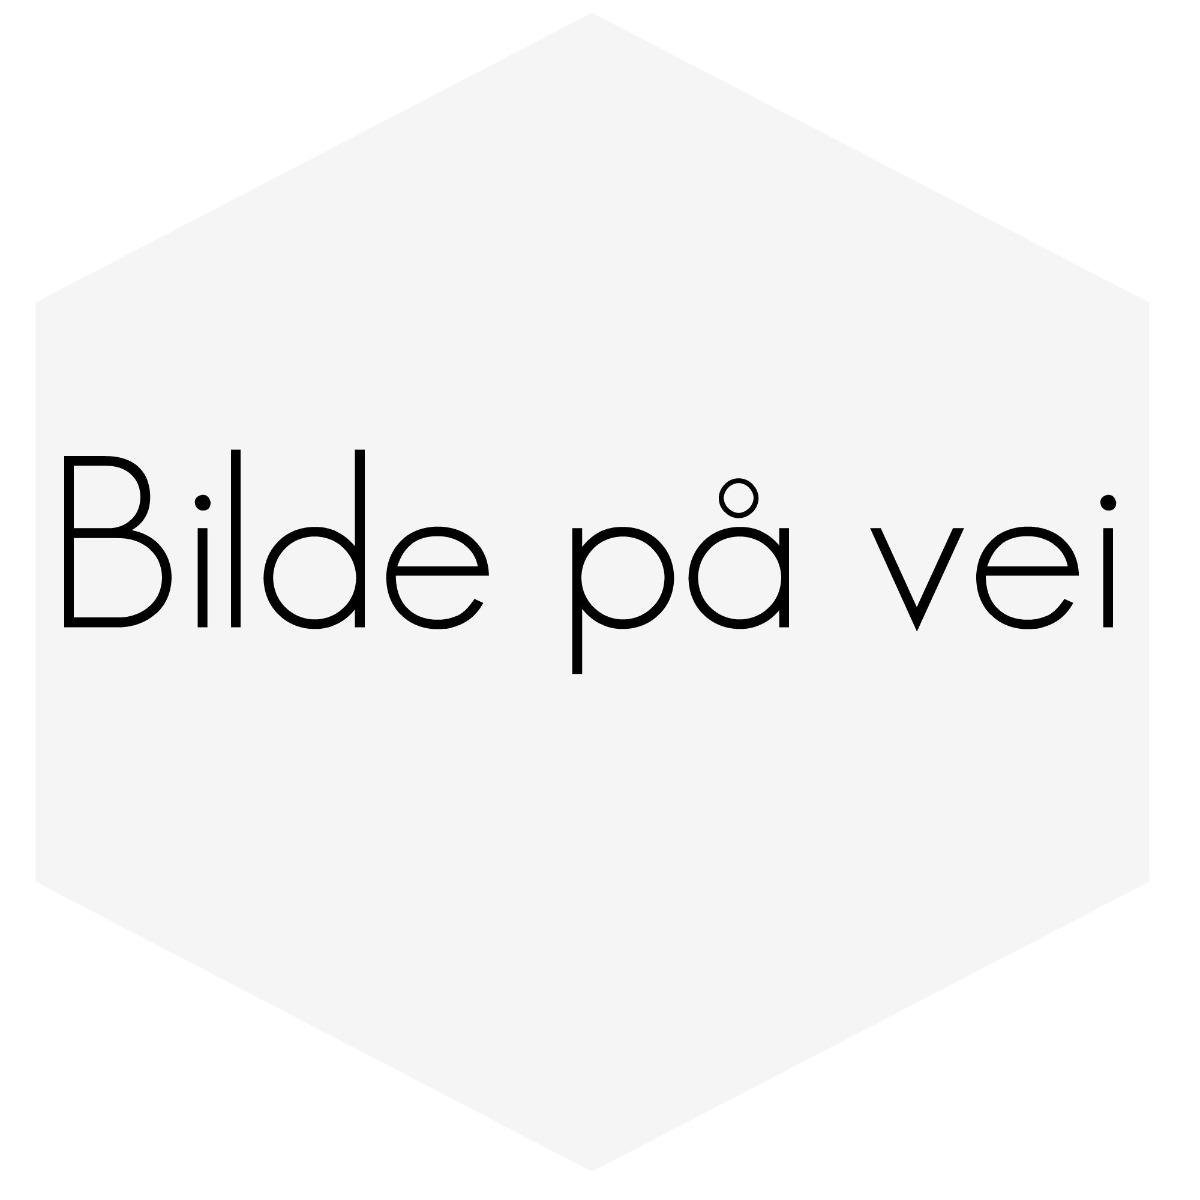 STØTDEMPER SPORT BILSTEIN PV FORAN pris stk